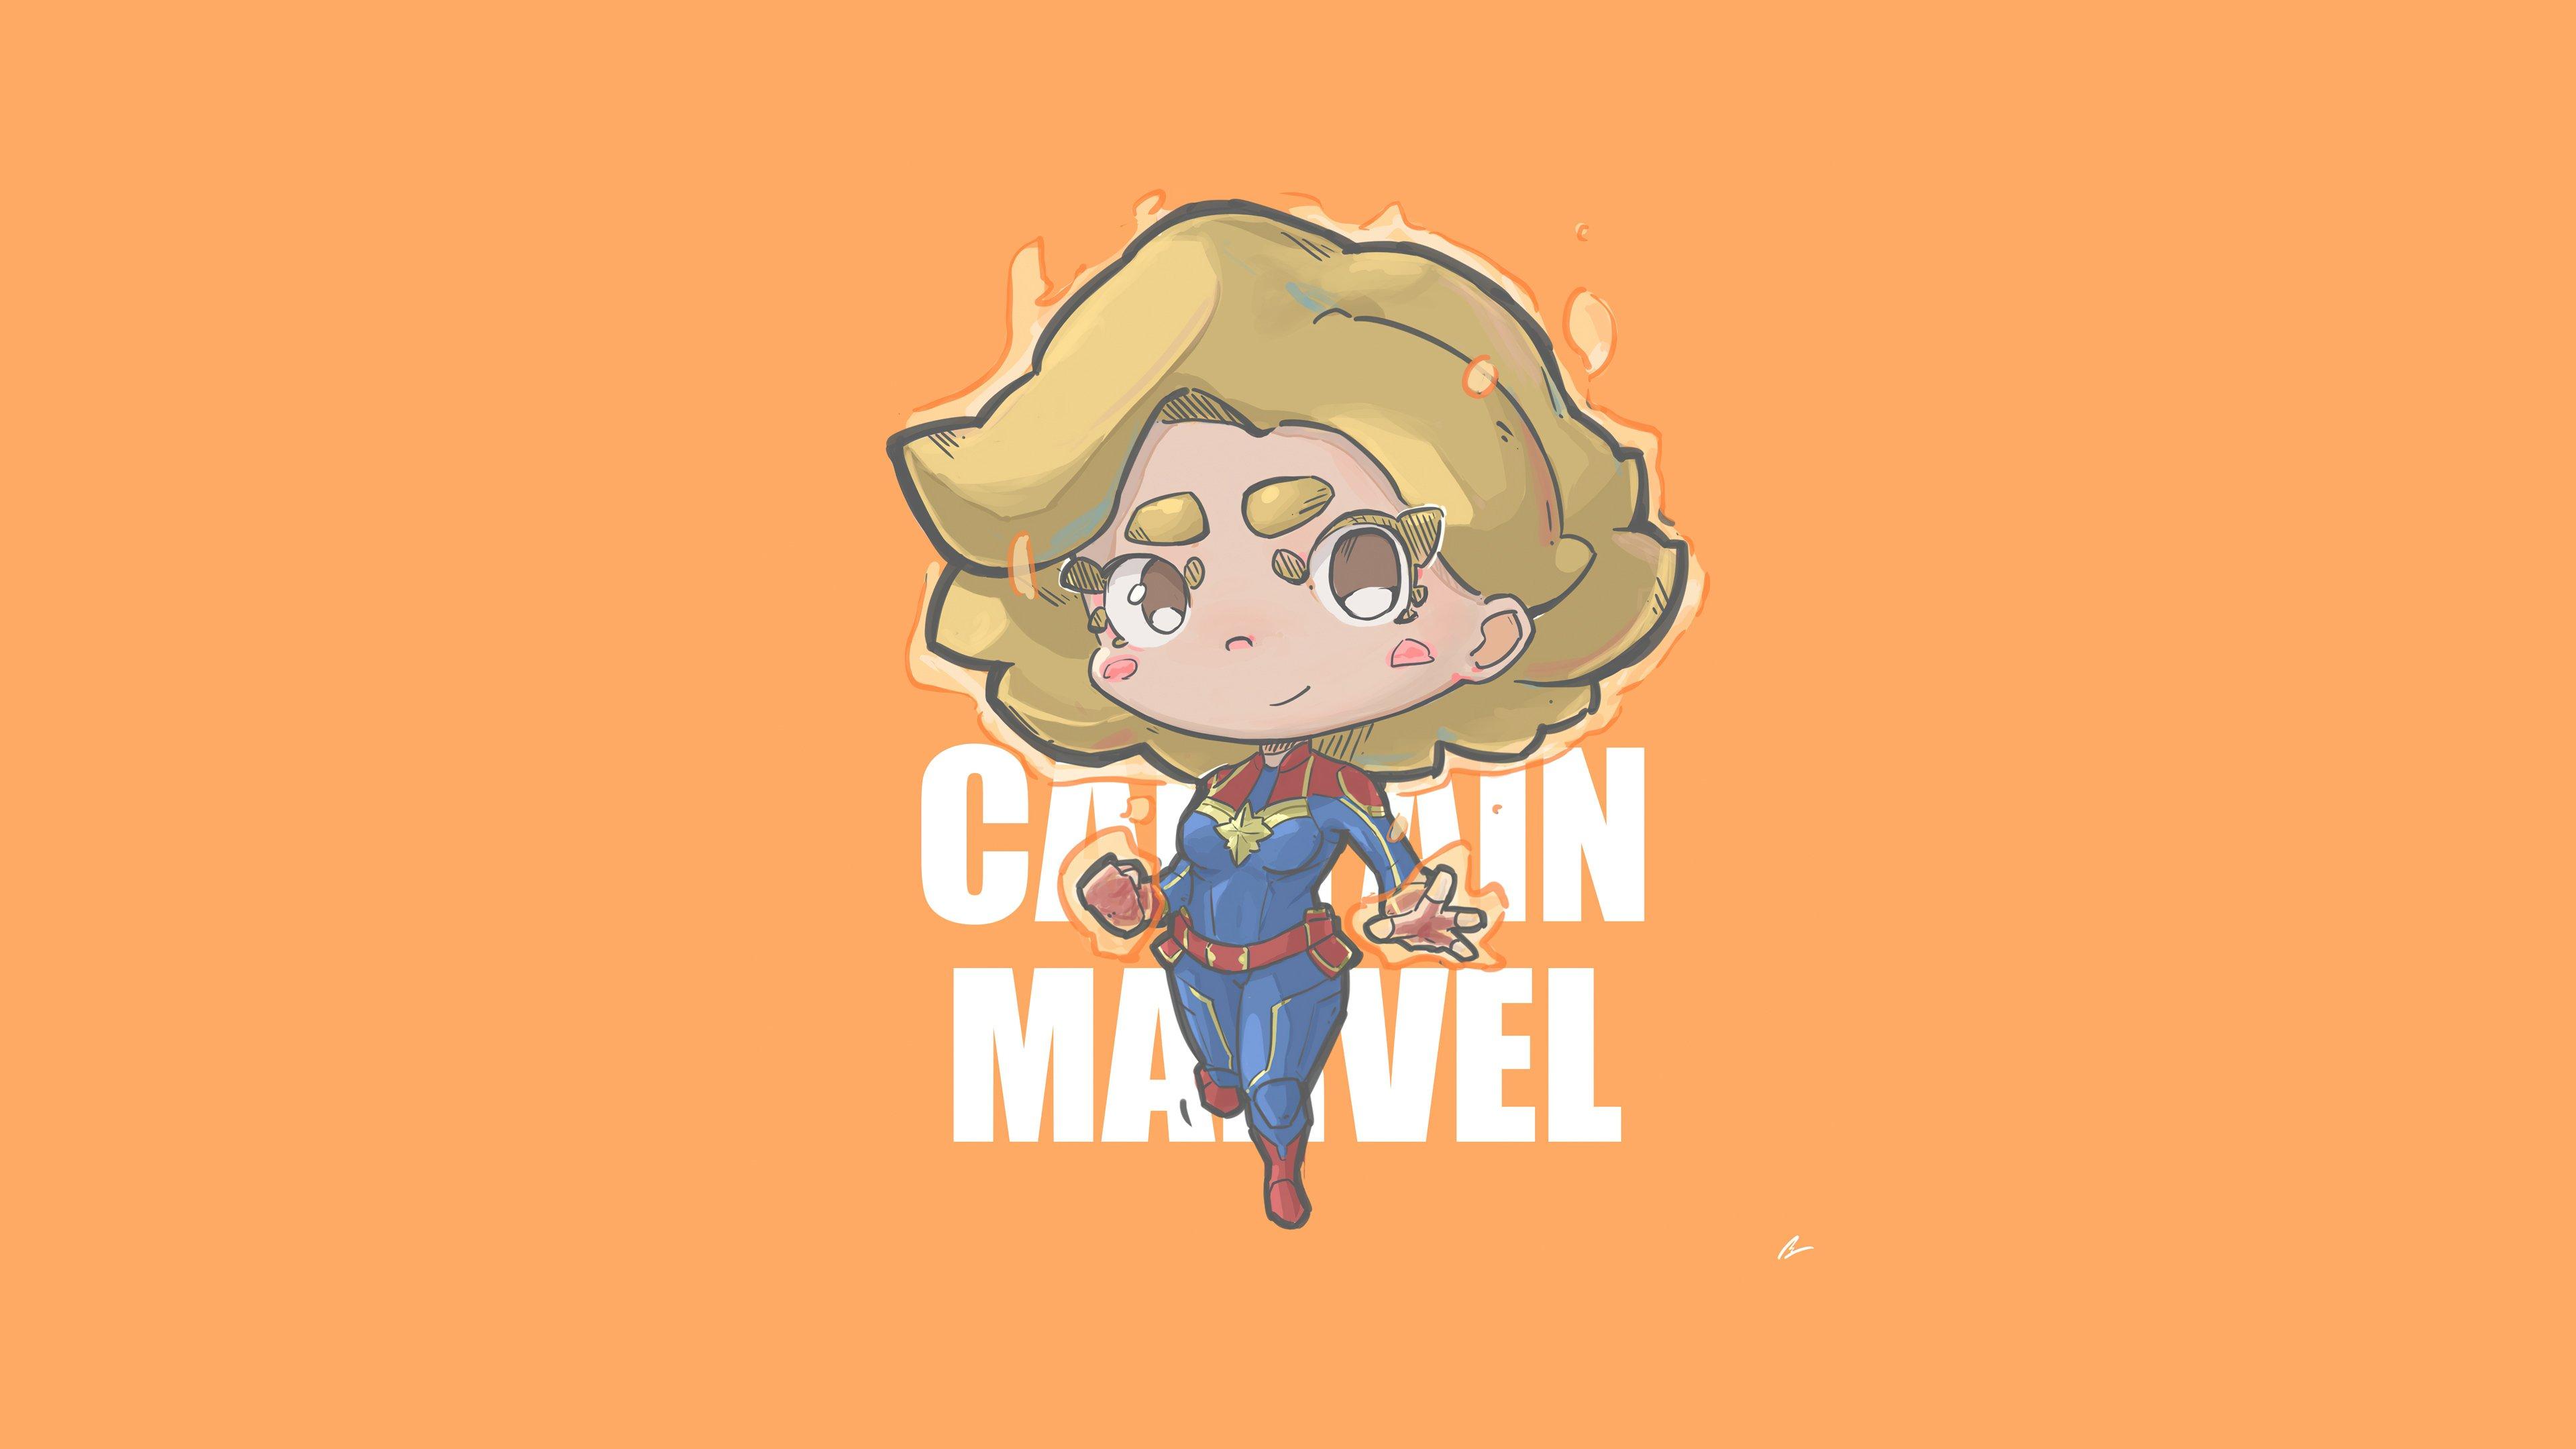 Fondos de pantalla Capitana Marvel Minimalista